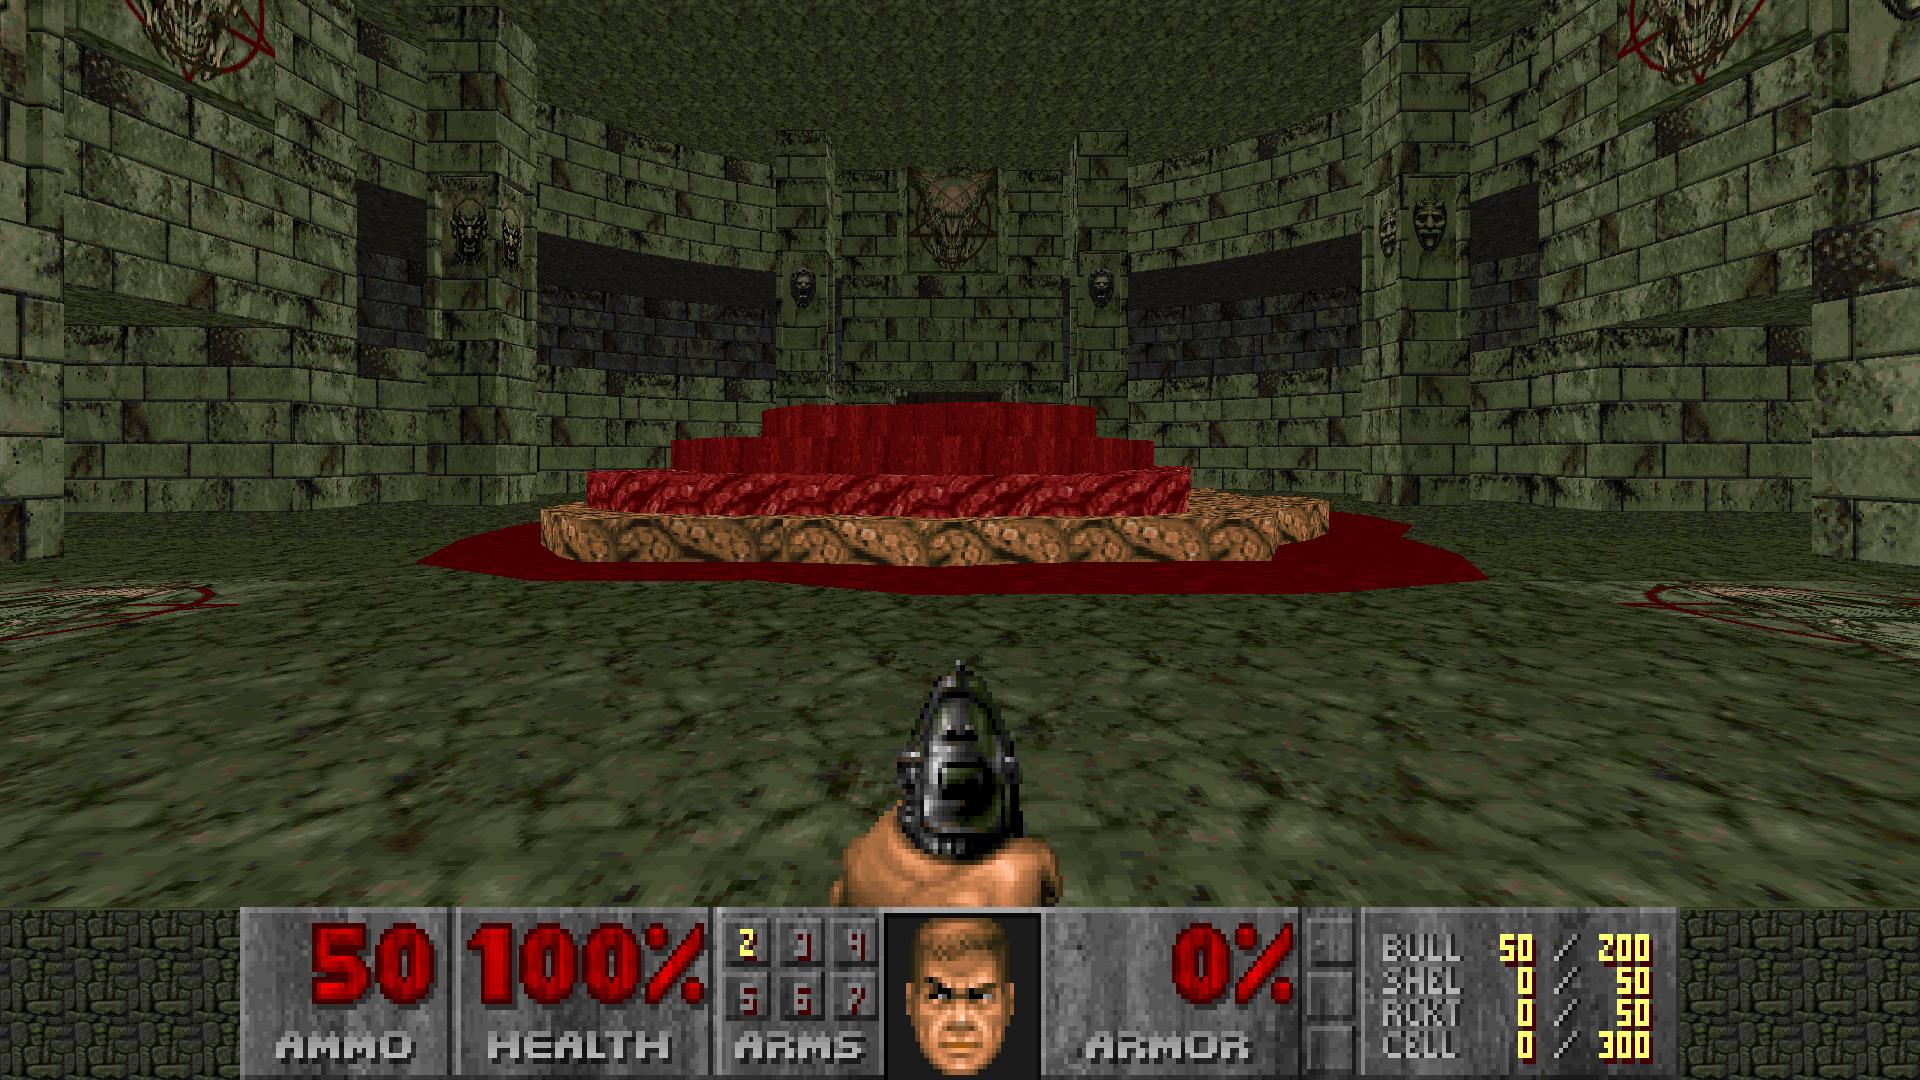 Screenshot_Doom_20210221_201836.png.9c8219419608c40b3baa7dd1dd09e7b9.png